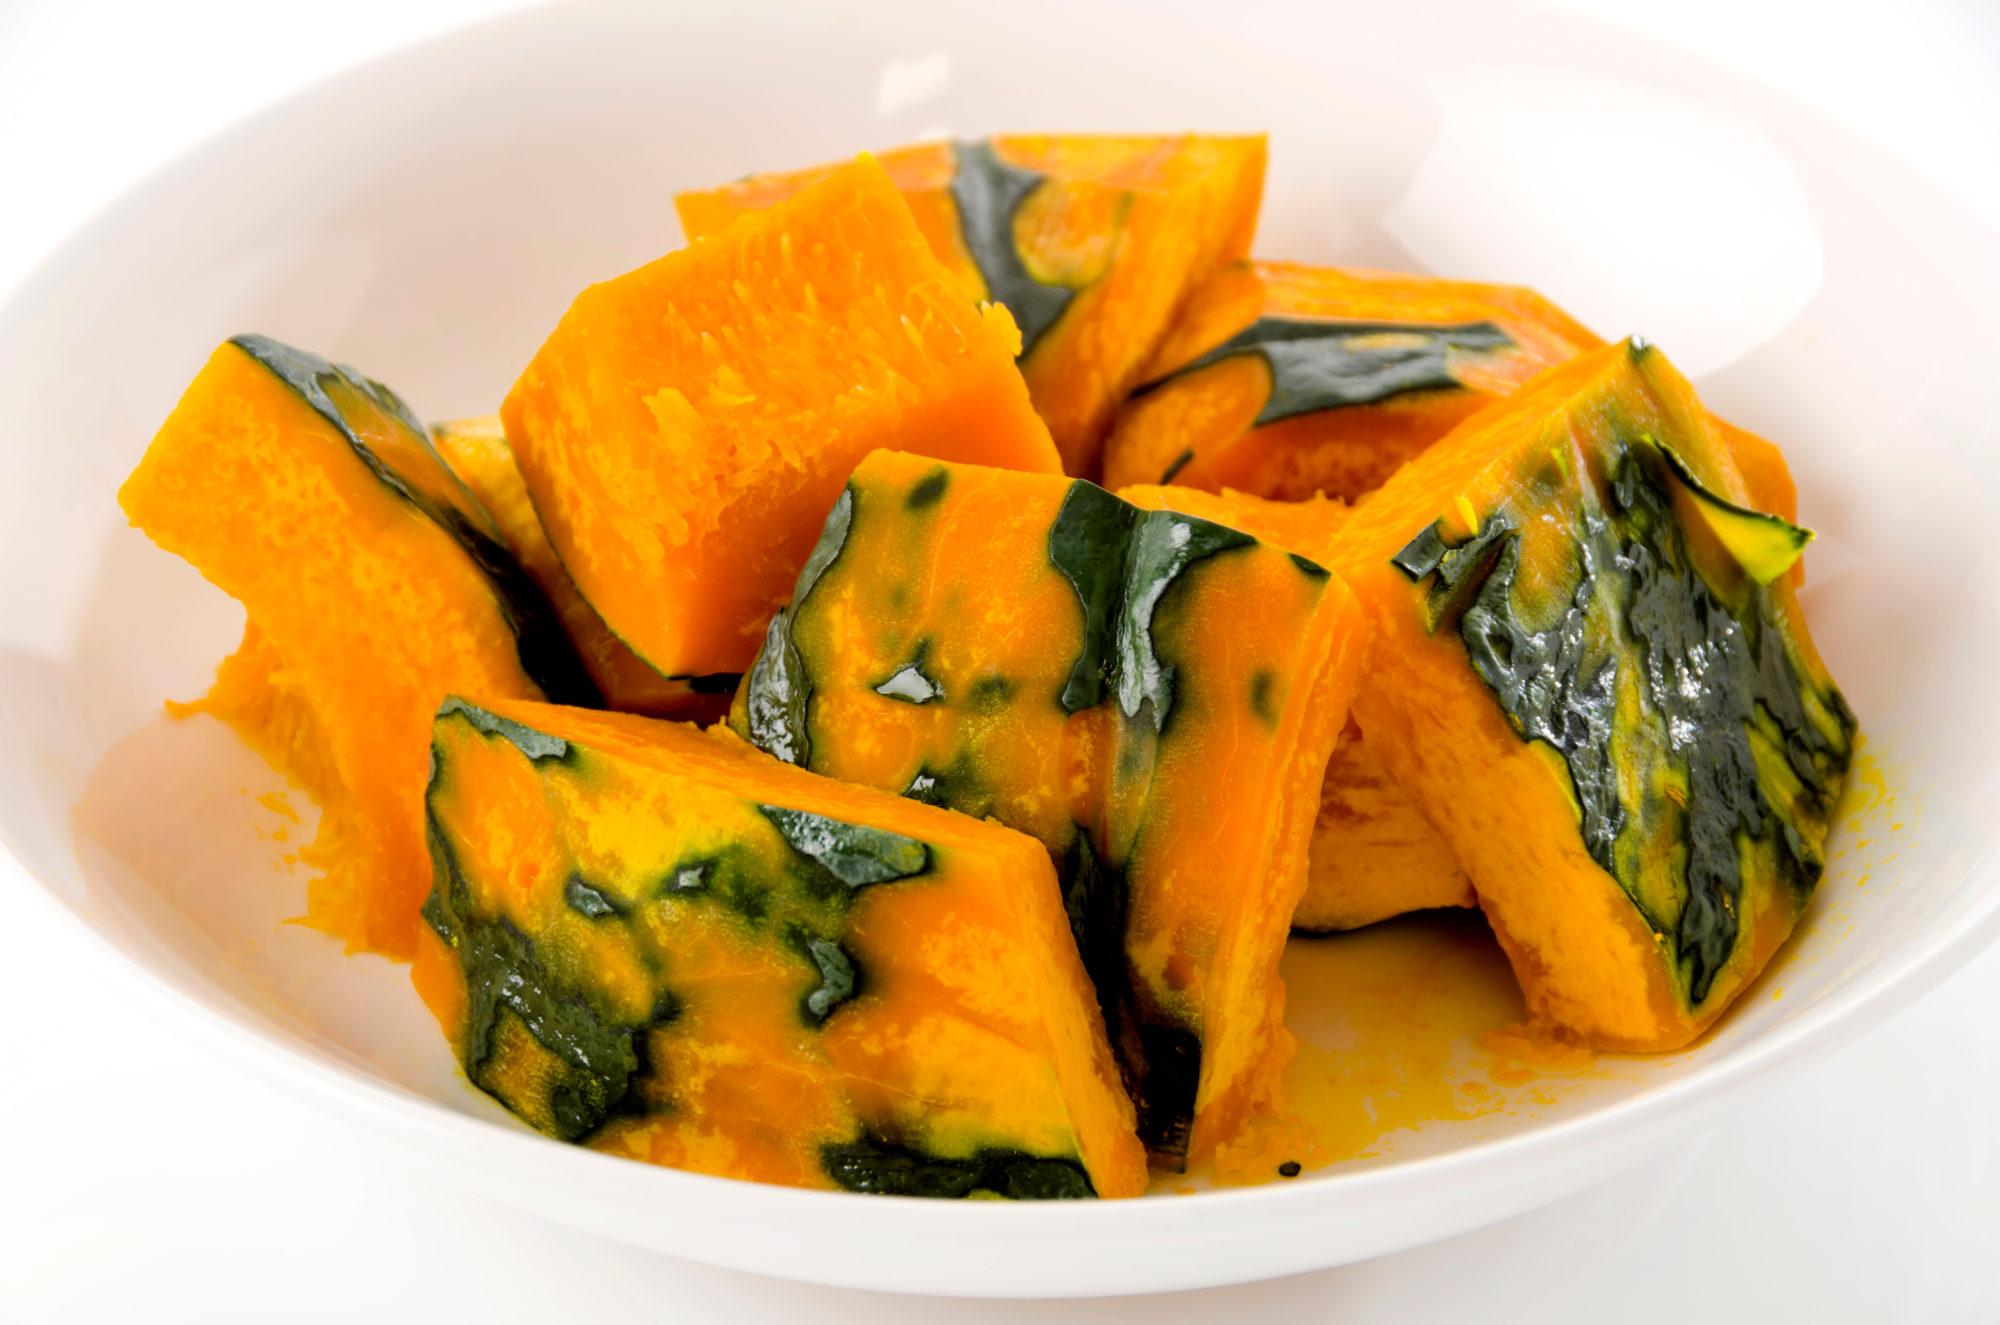 Kabocha for digestive health